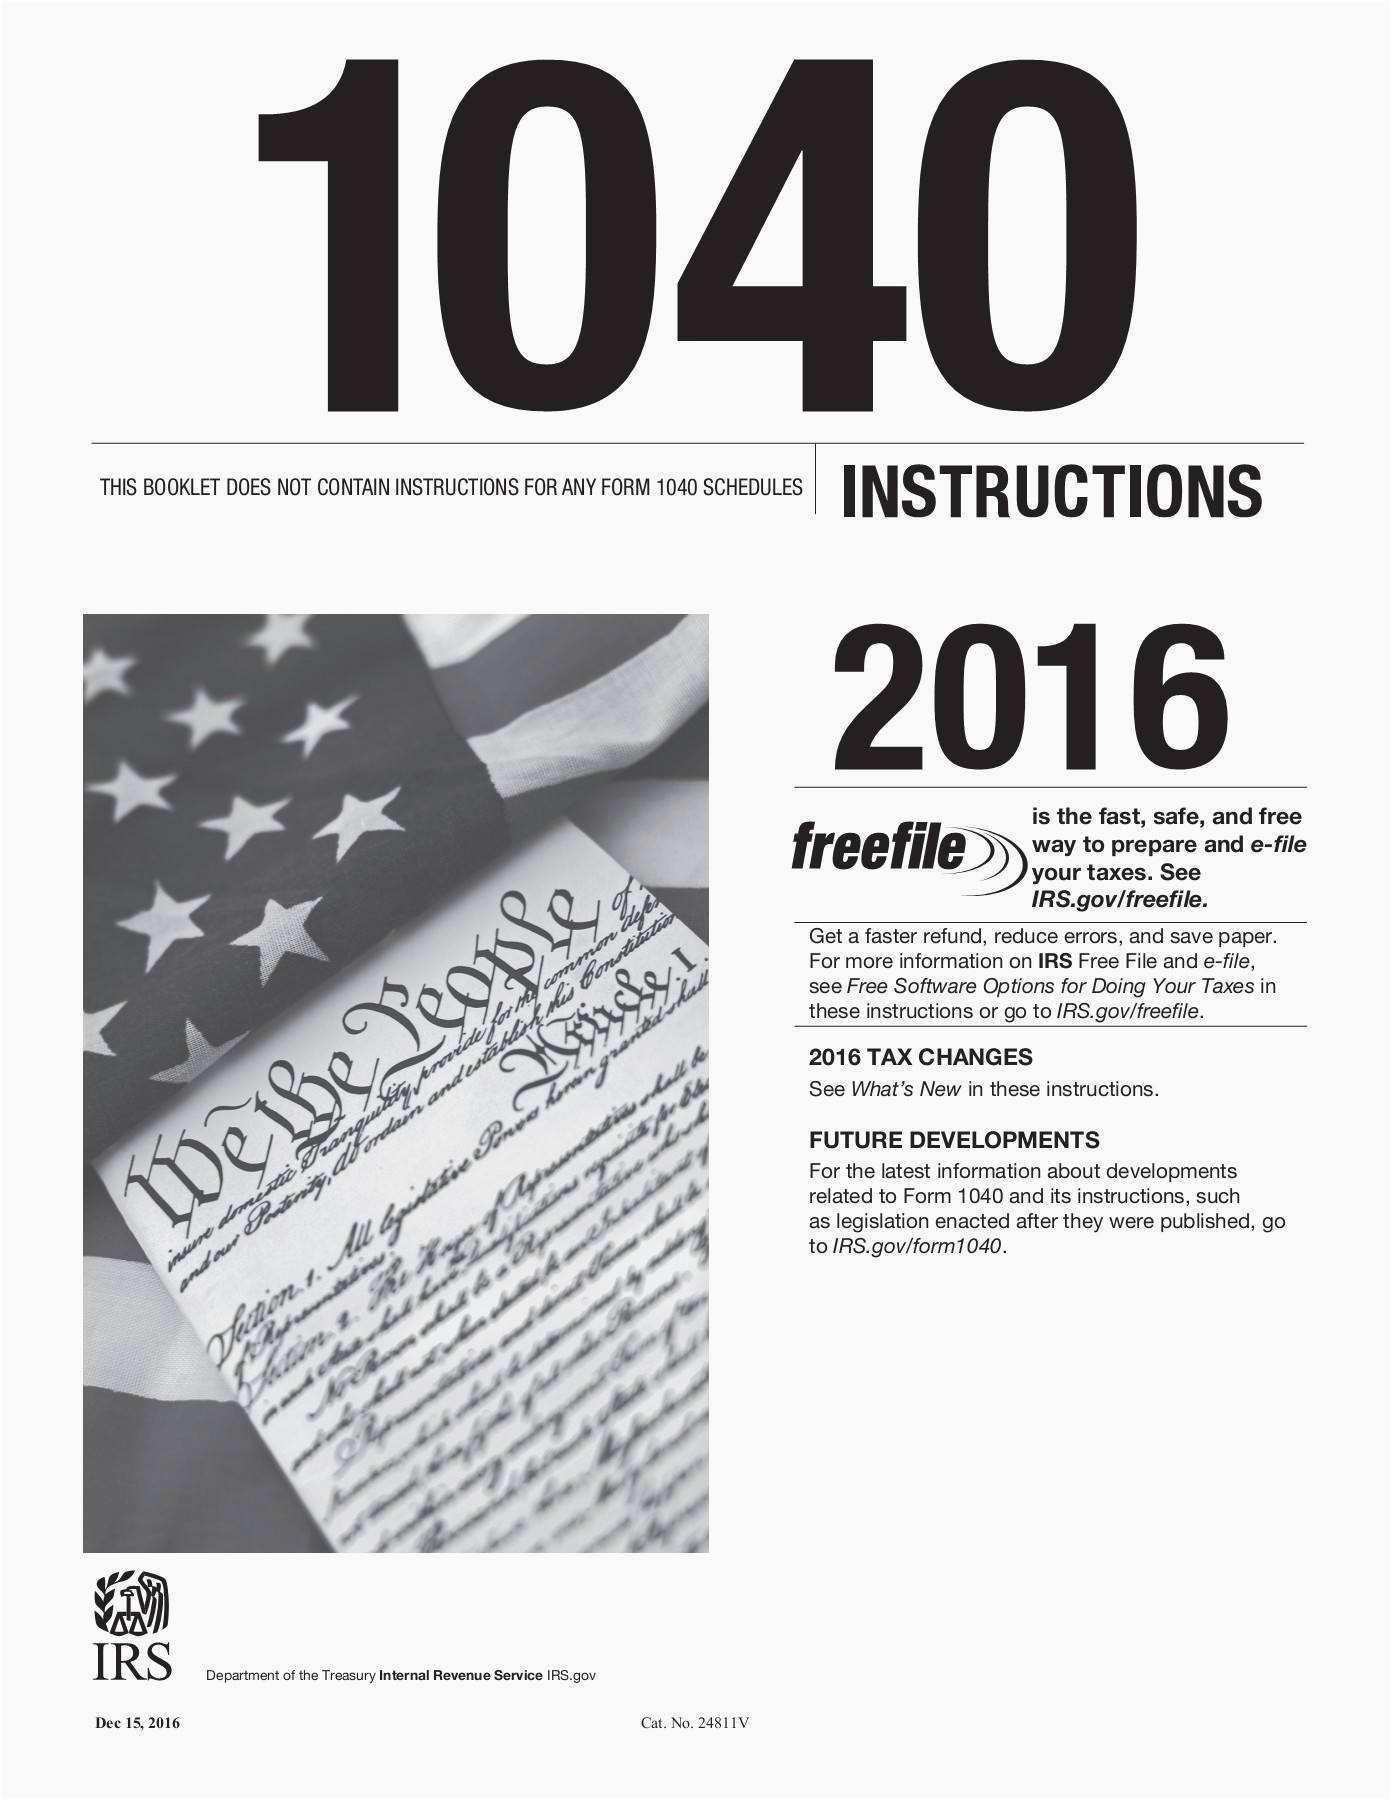 E File Tax Form 4868 Online